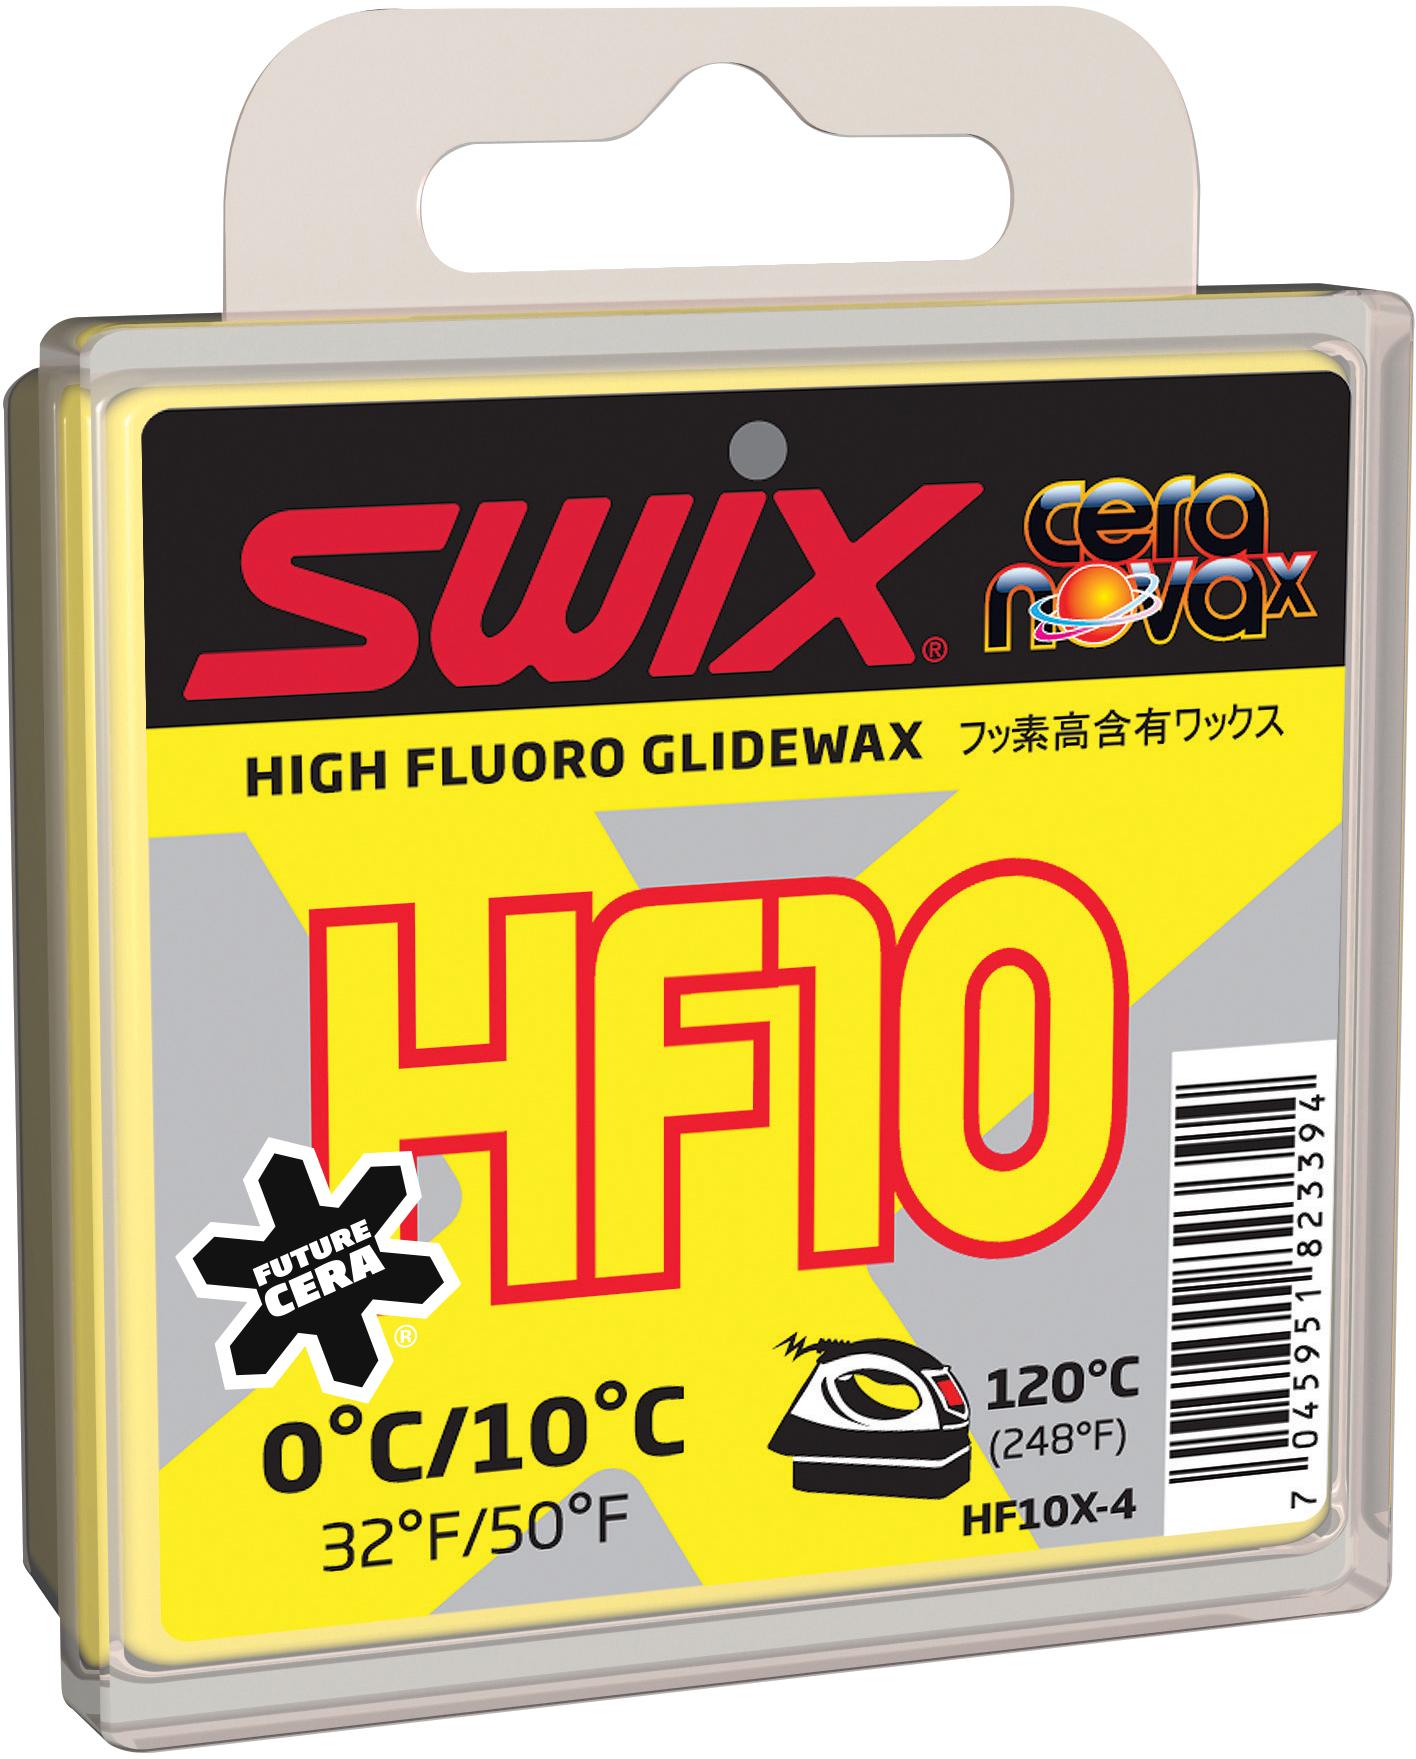 Swix Мазь скольжения Swix HF10X, 0C/+10C мазь твердая swix v0060 swix красный 45гр